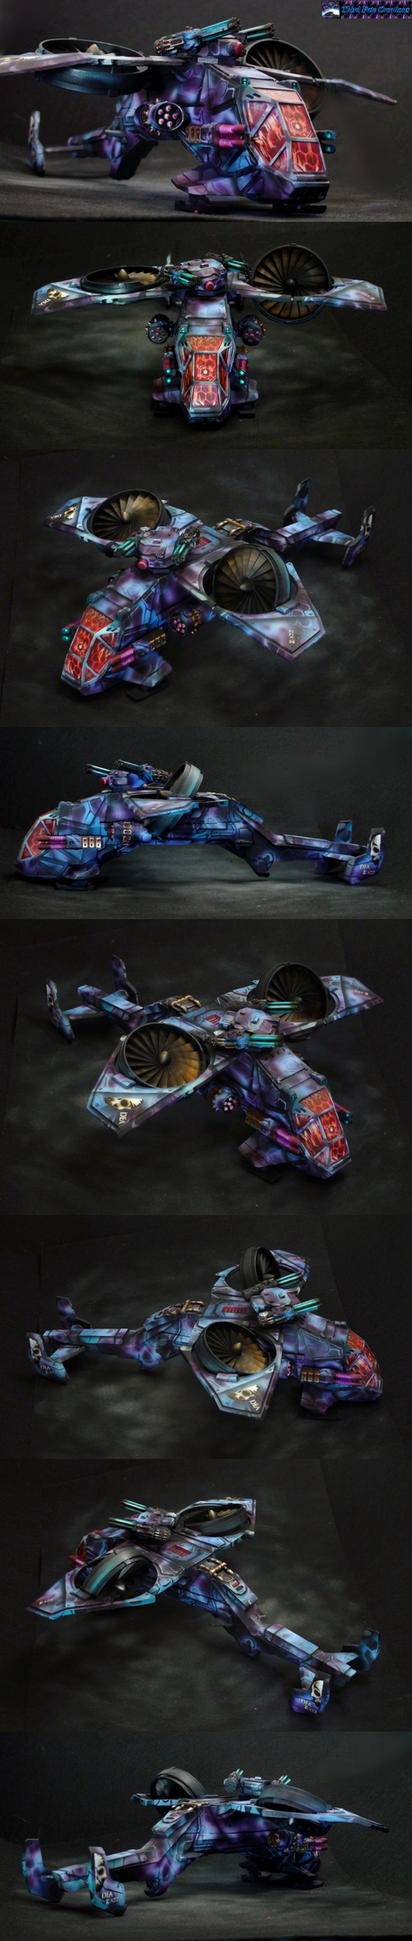 Data Enforcement Agency's Dragonfly mk2 by Atropos907